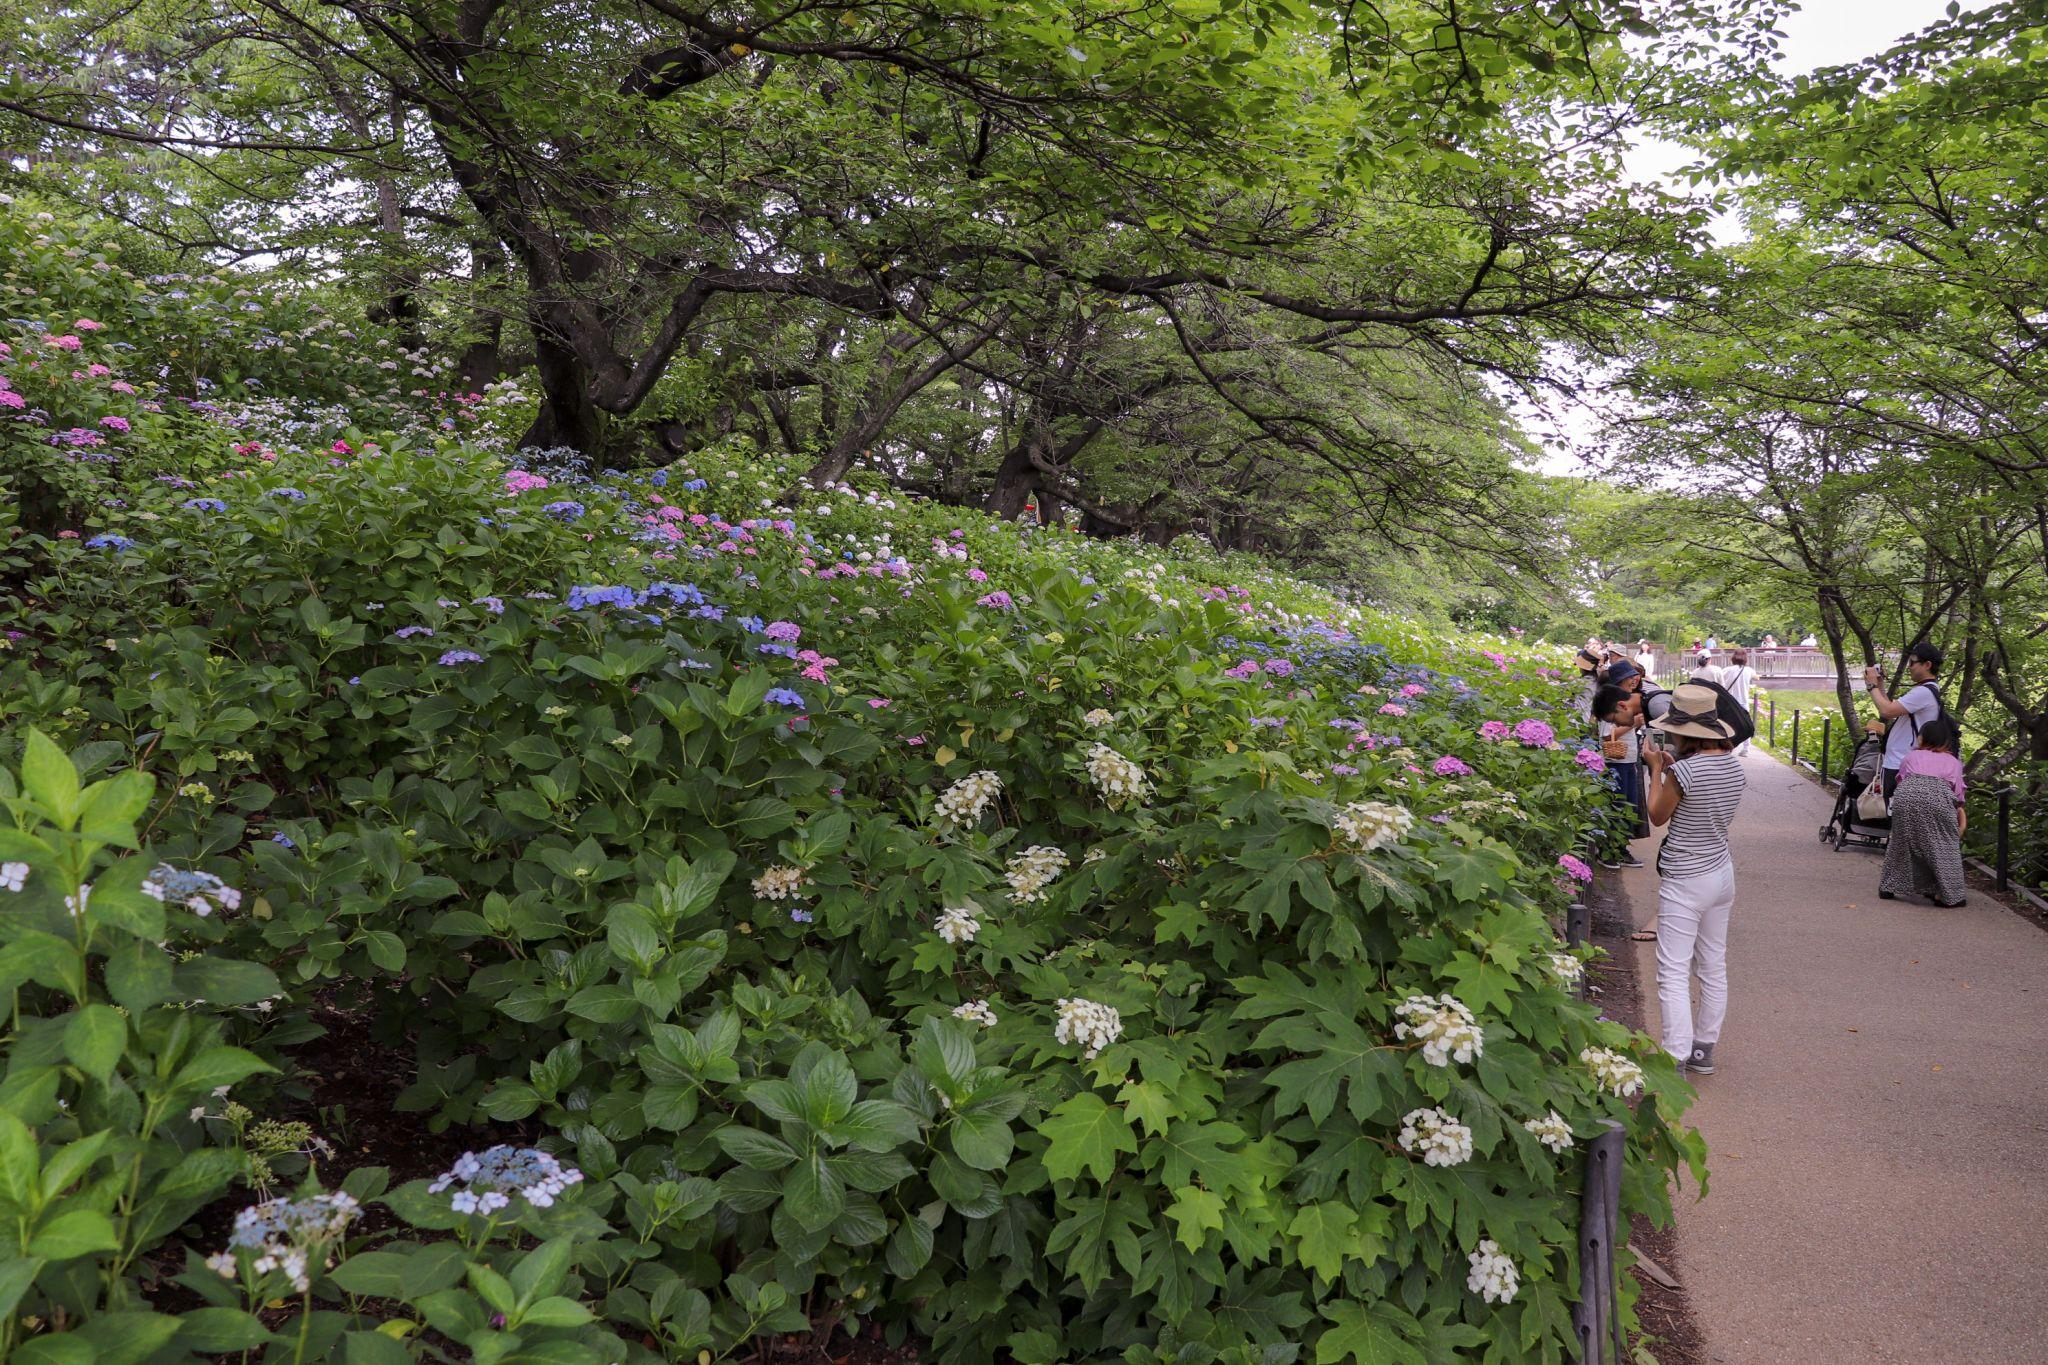 Hydrangea at Gongendo Park, Japan